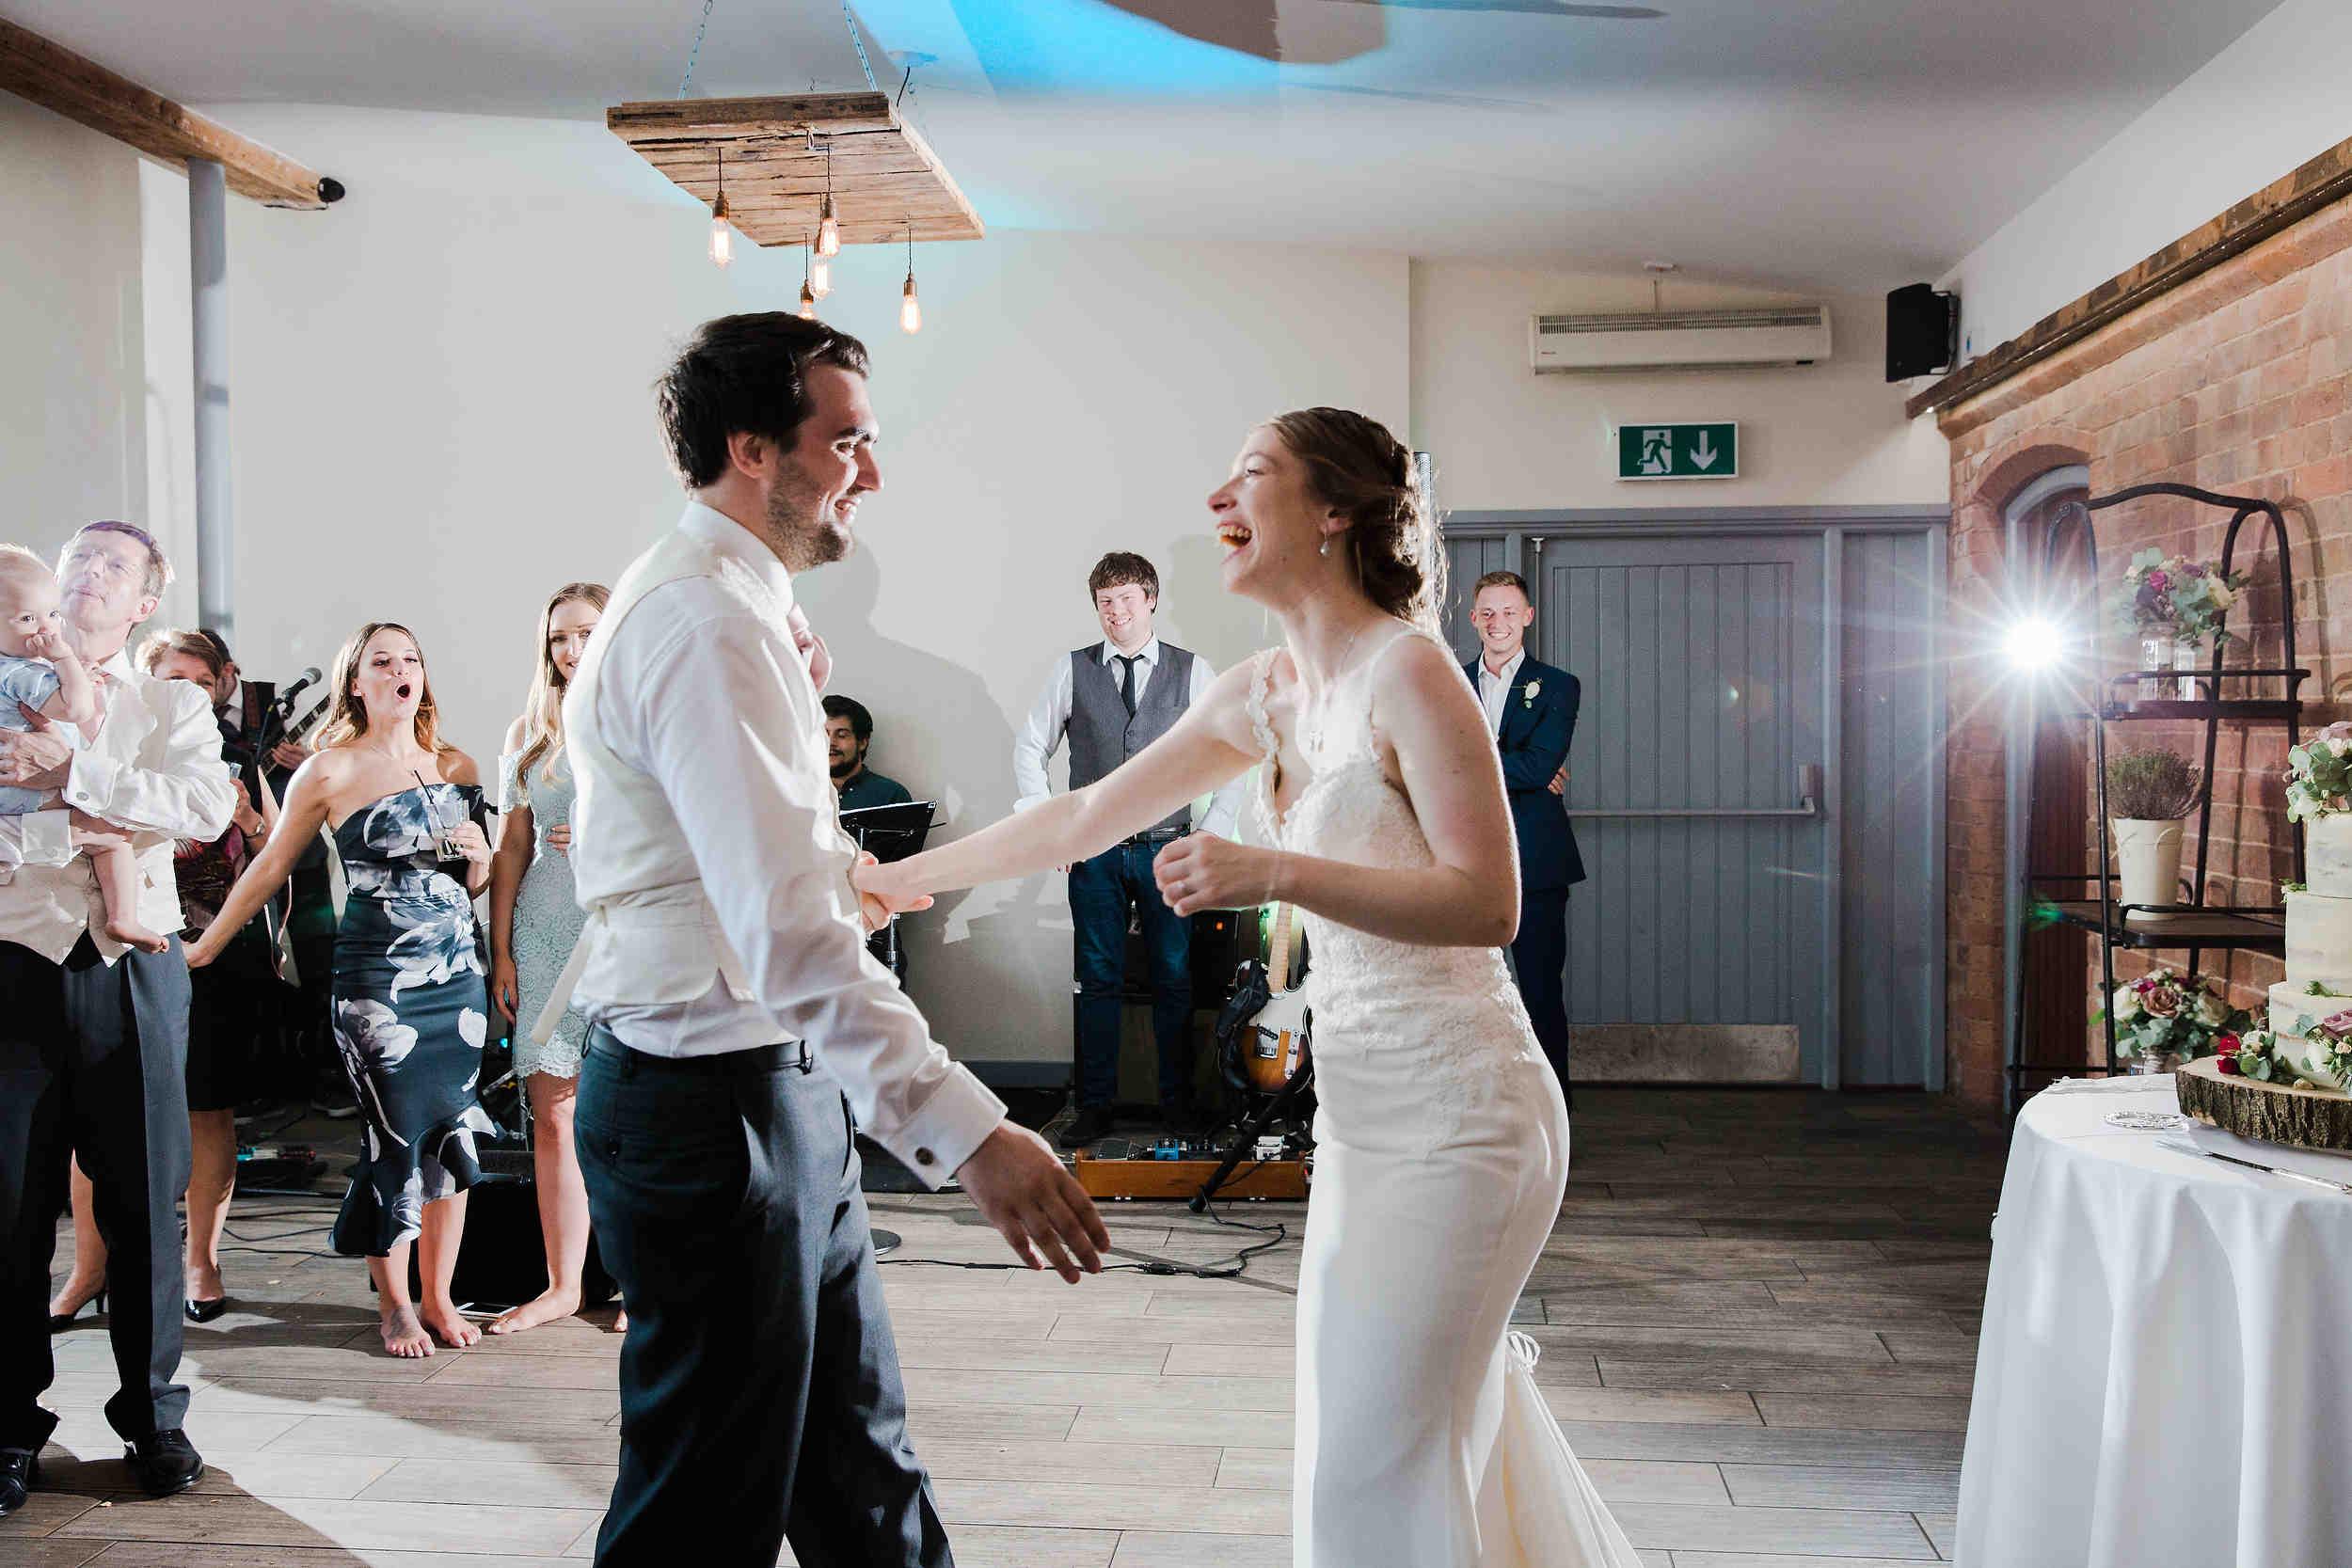 Modern_Stylish_Wedding_at_Swallows_Nest_Barn1307